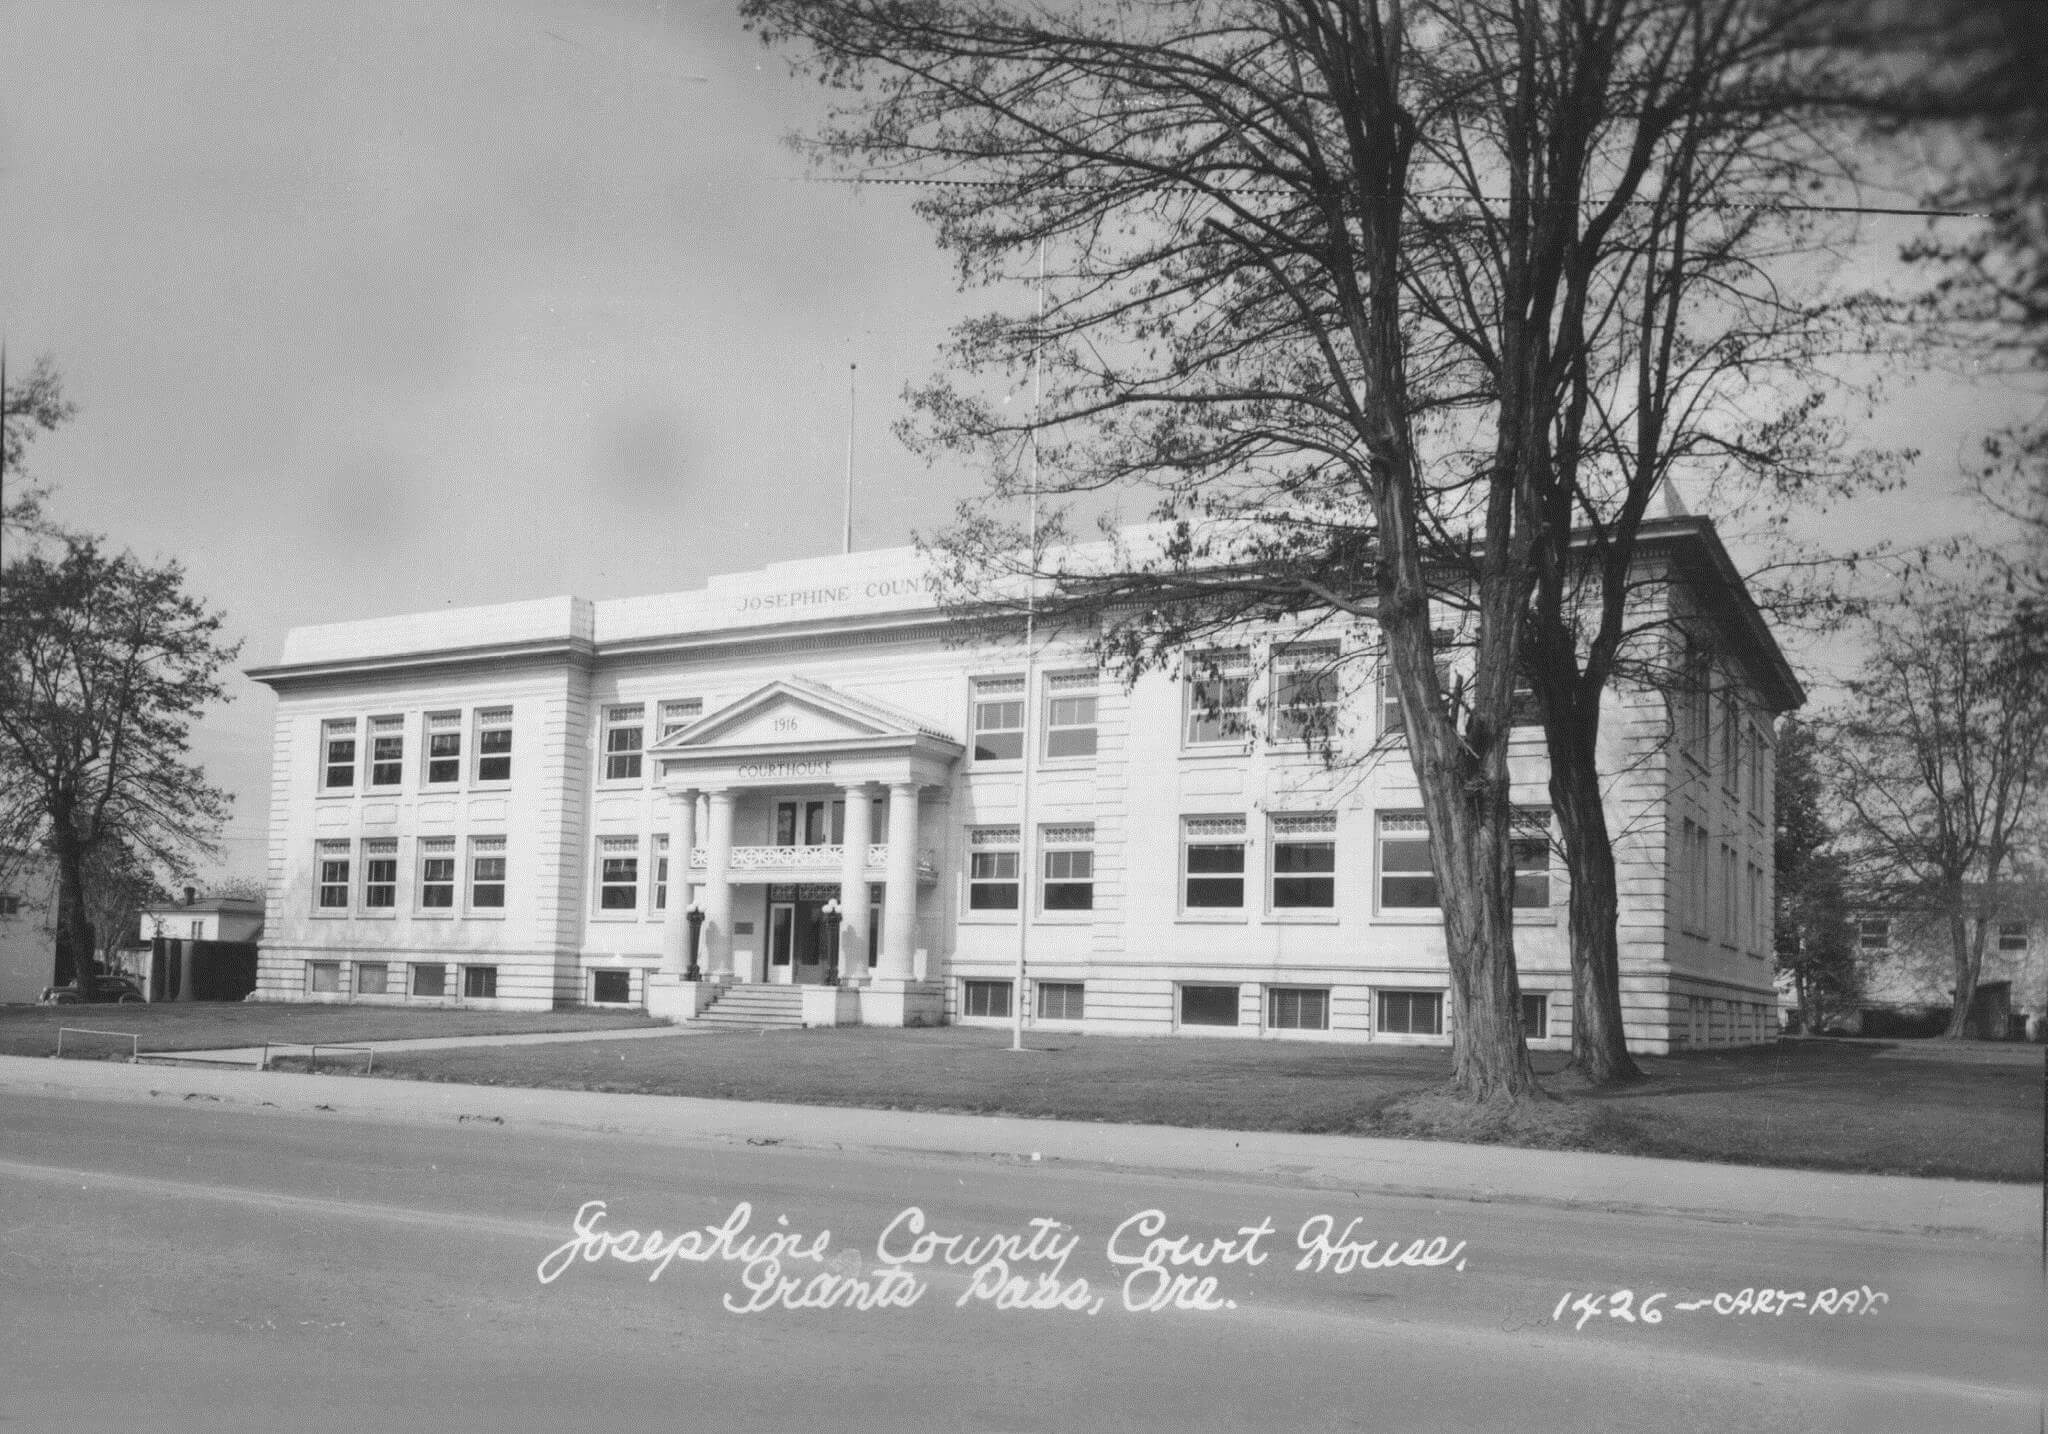 historic courthouse photo